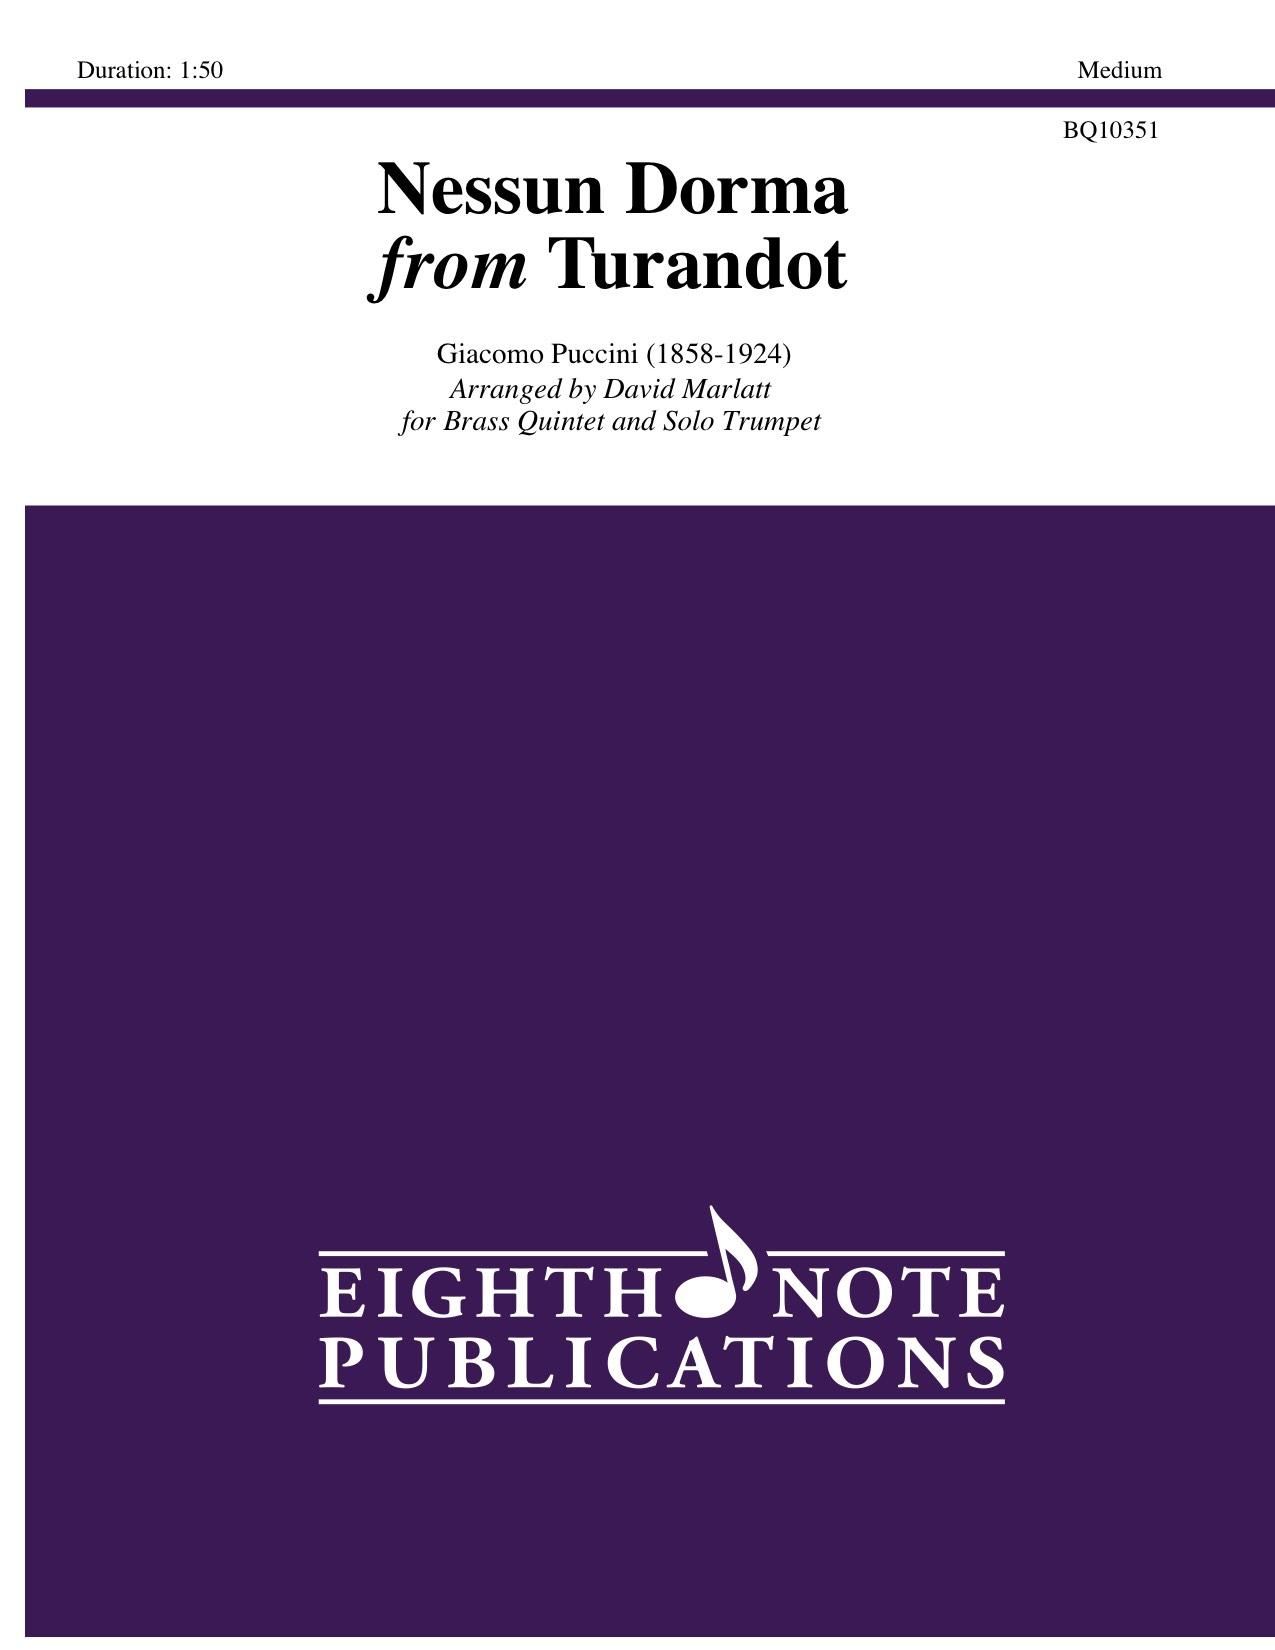 Nessun Dorma from Turandot - Giacomo Puccini